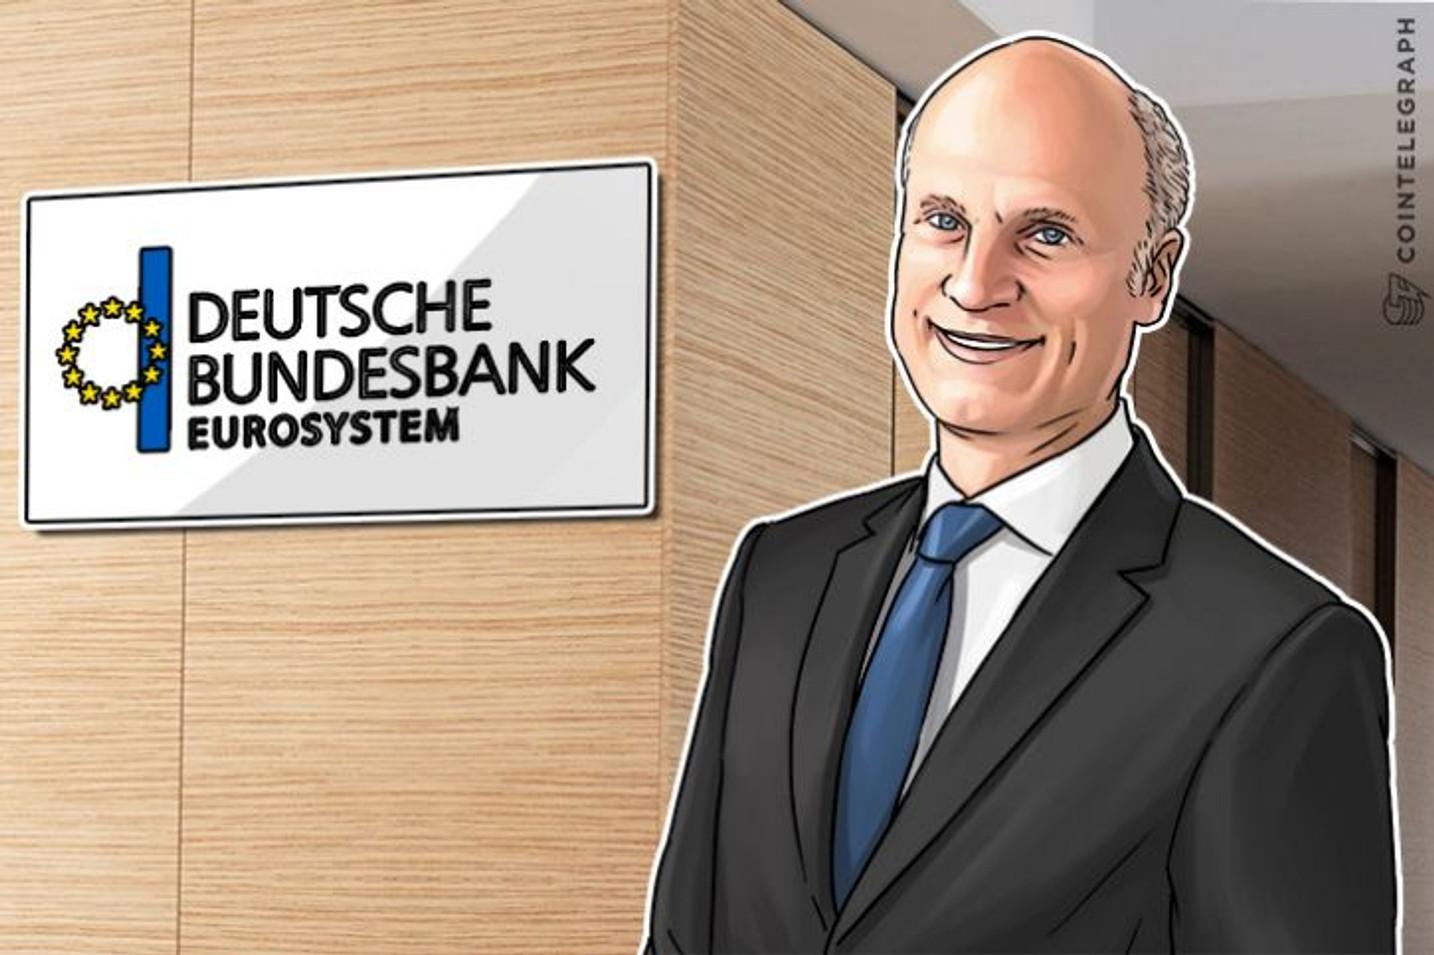 Nemačka centralna banka testira blokčein prototip za trgovanje hartijama od vrednosti